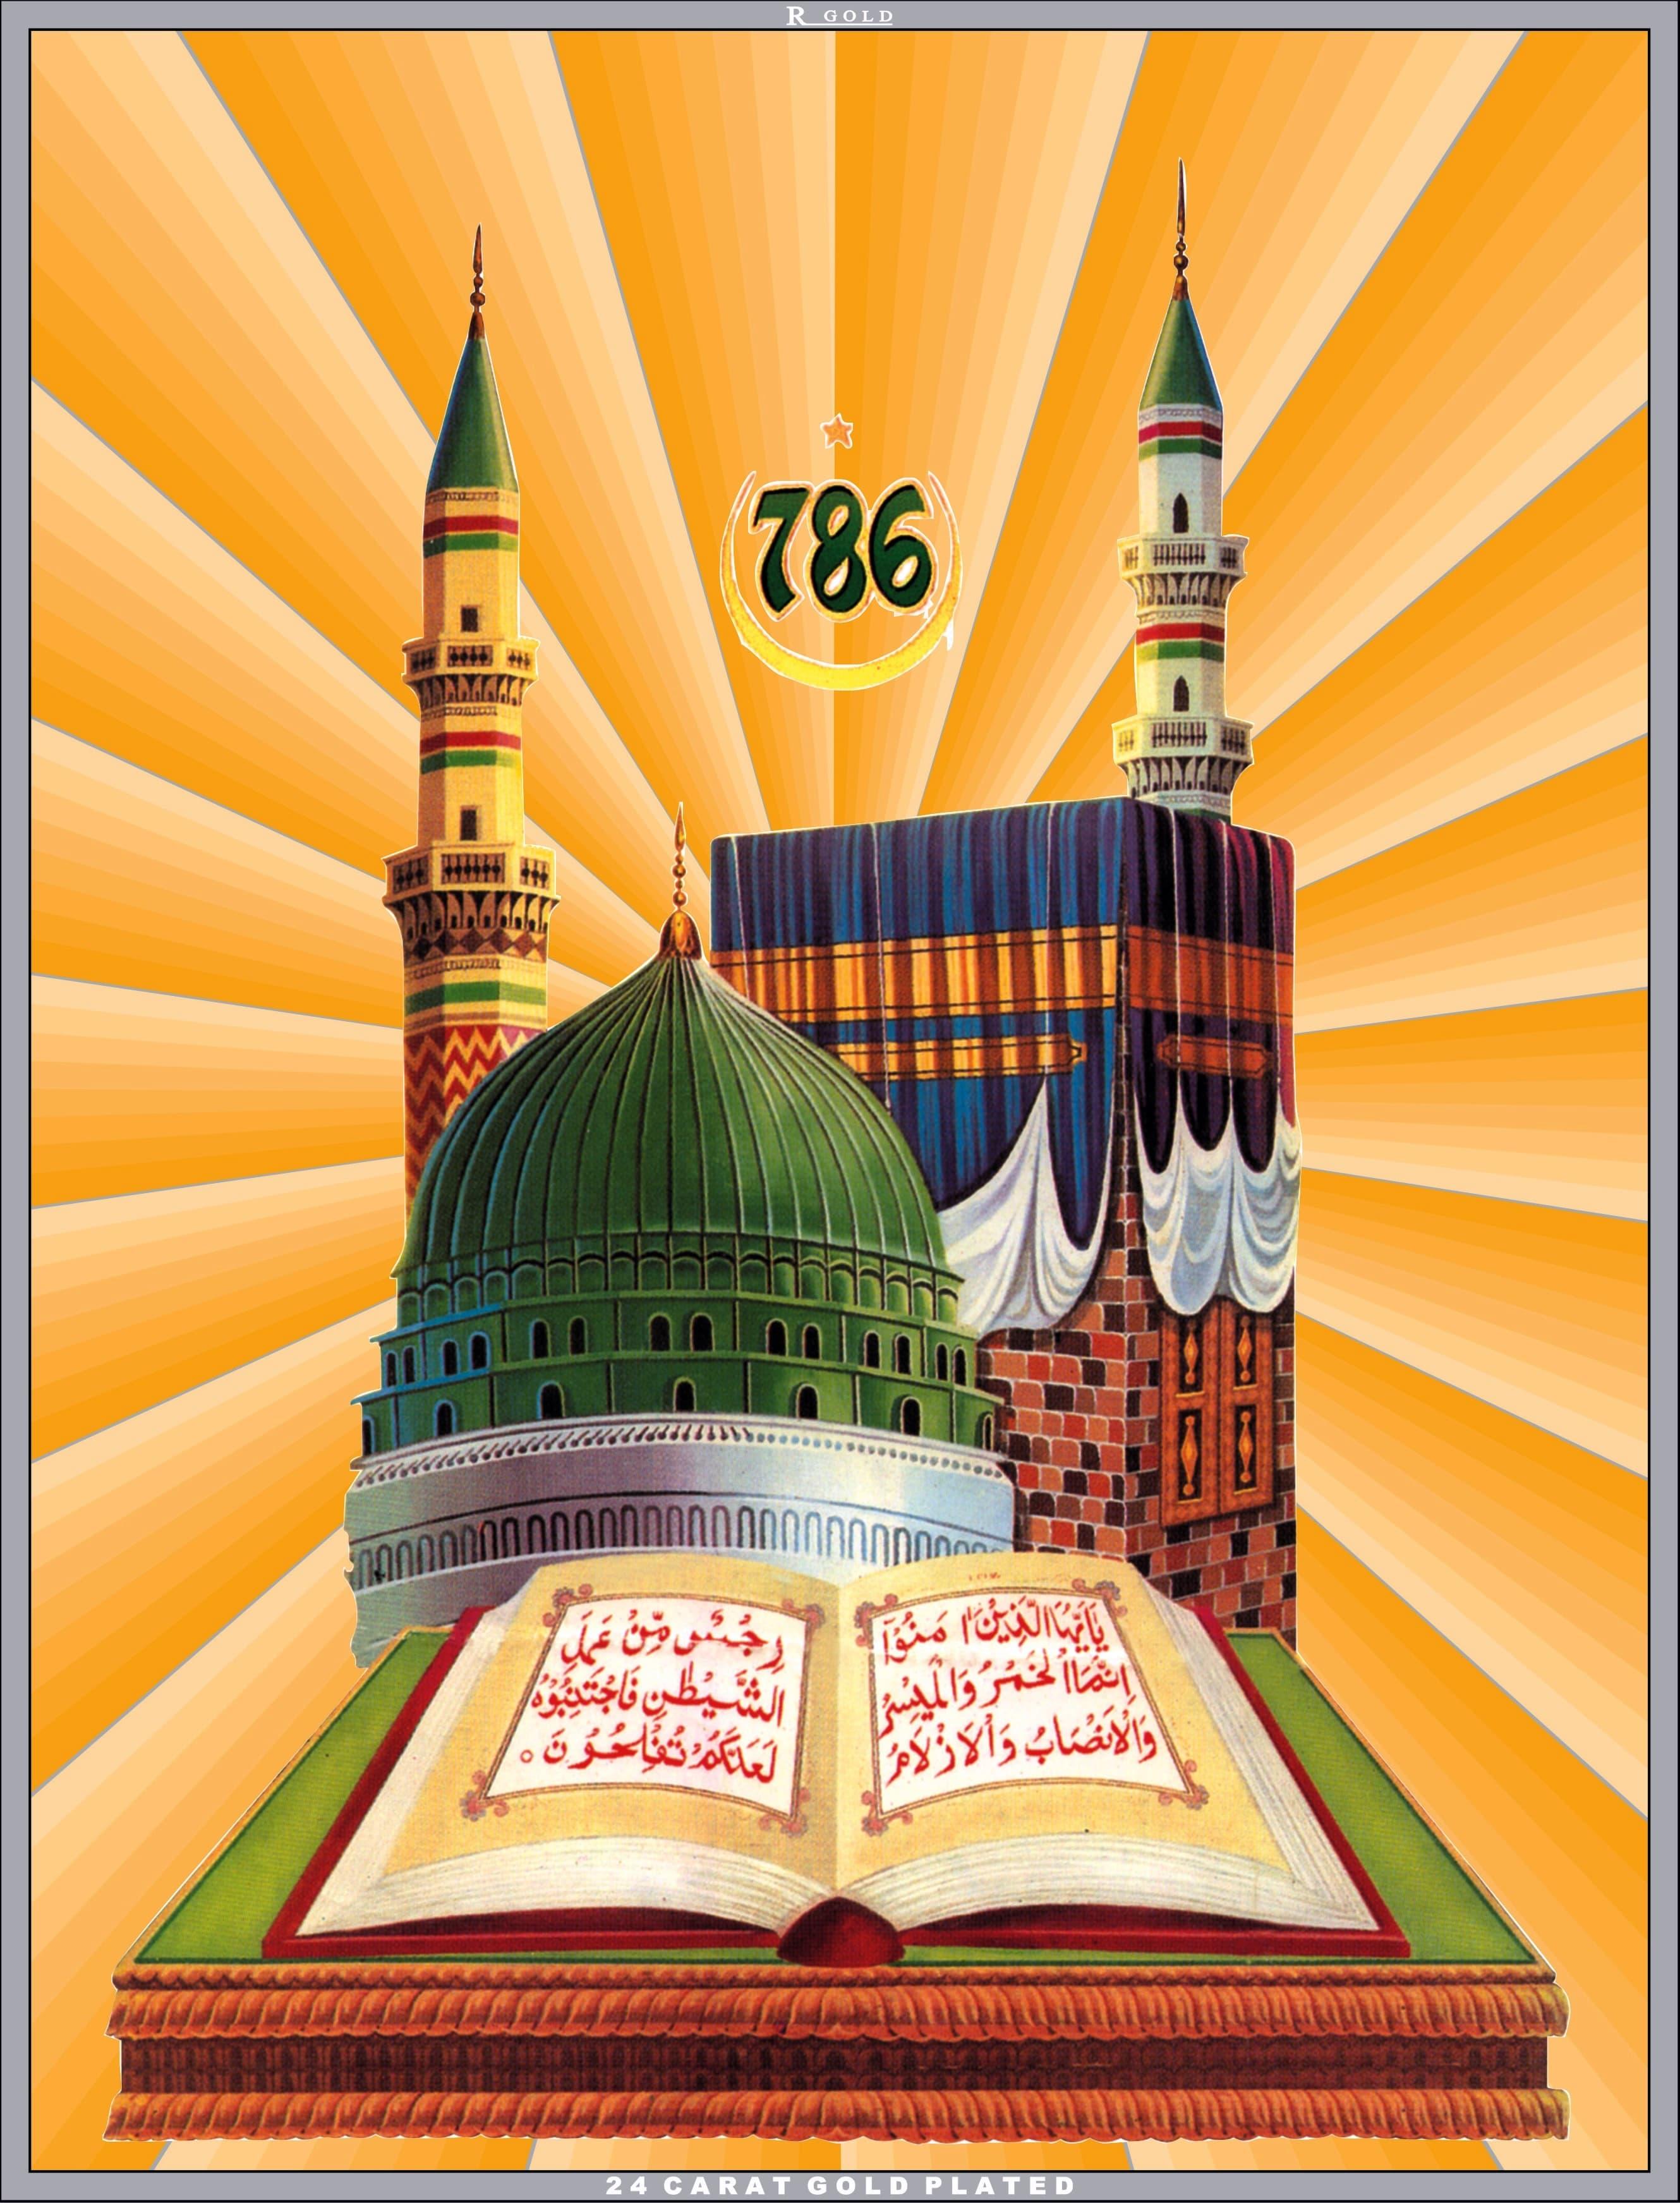 Gold Plated In 24 Carat Frame Islamic Dua Kaaba Mecca